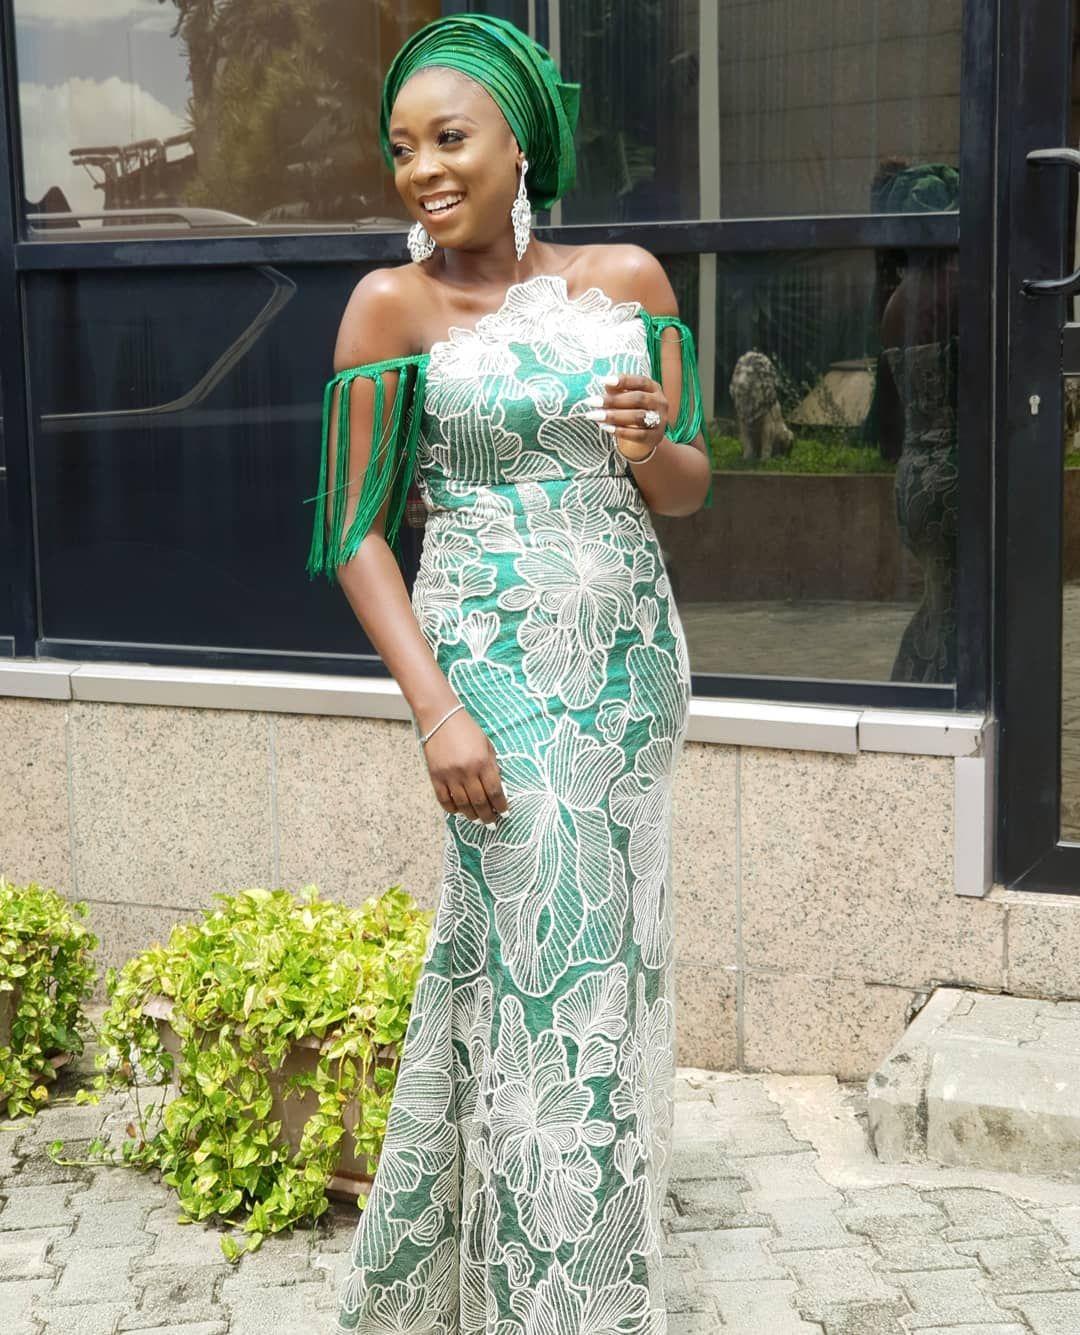 Latest Aso Ebi Styles For Wedding Guest In 2020 African Lace Dresses Nigerian Wedding Fashion Aso Ebi Styles